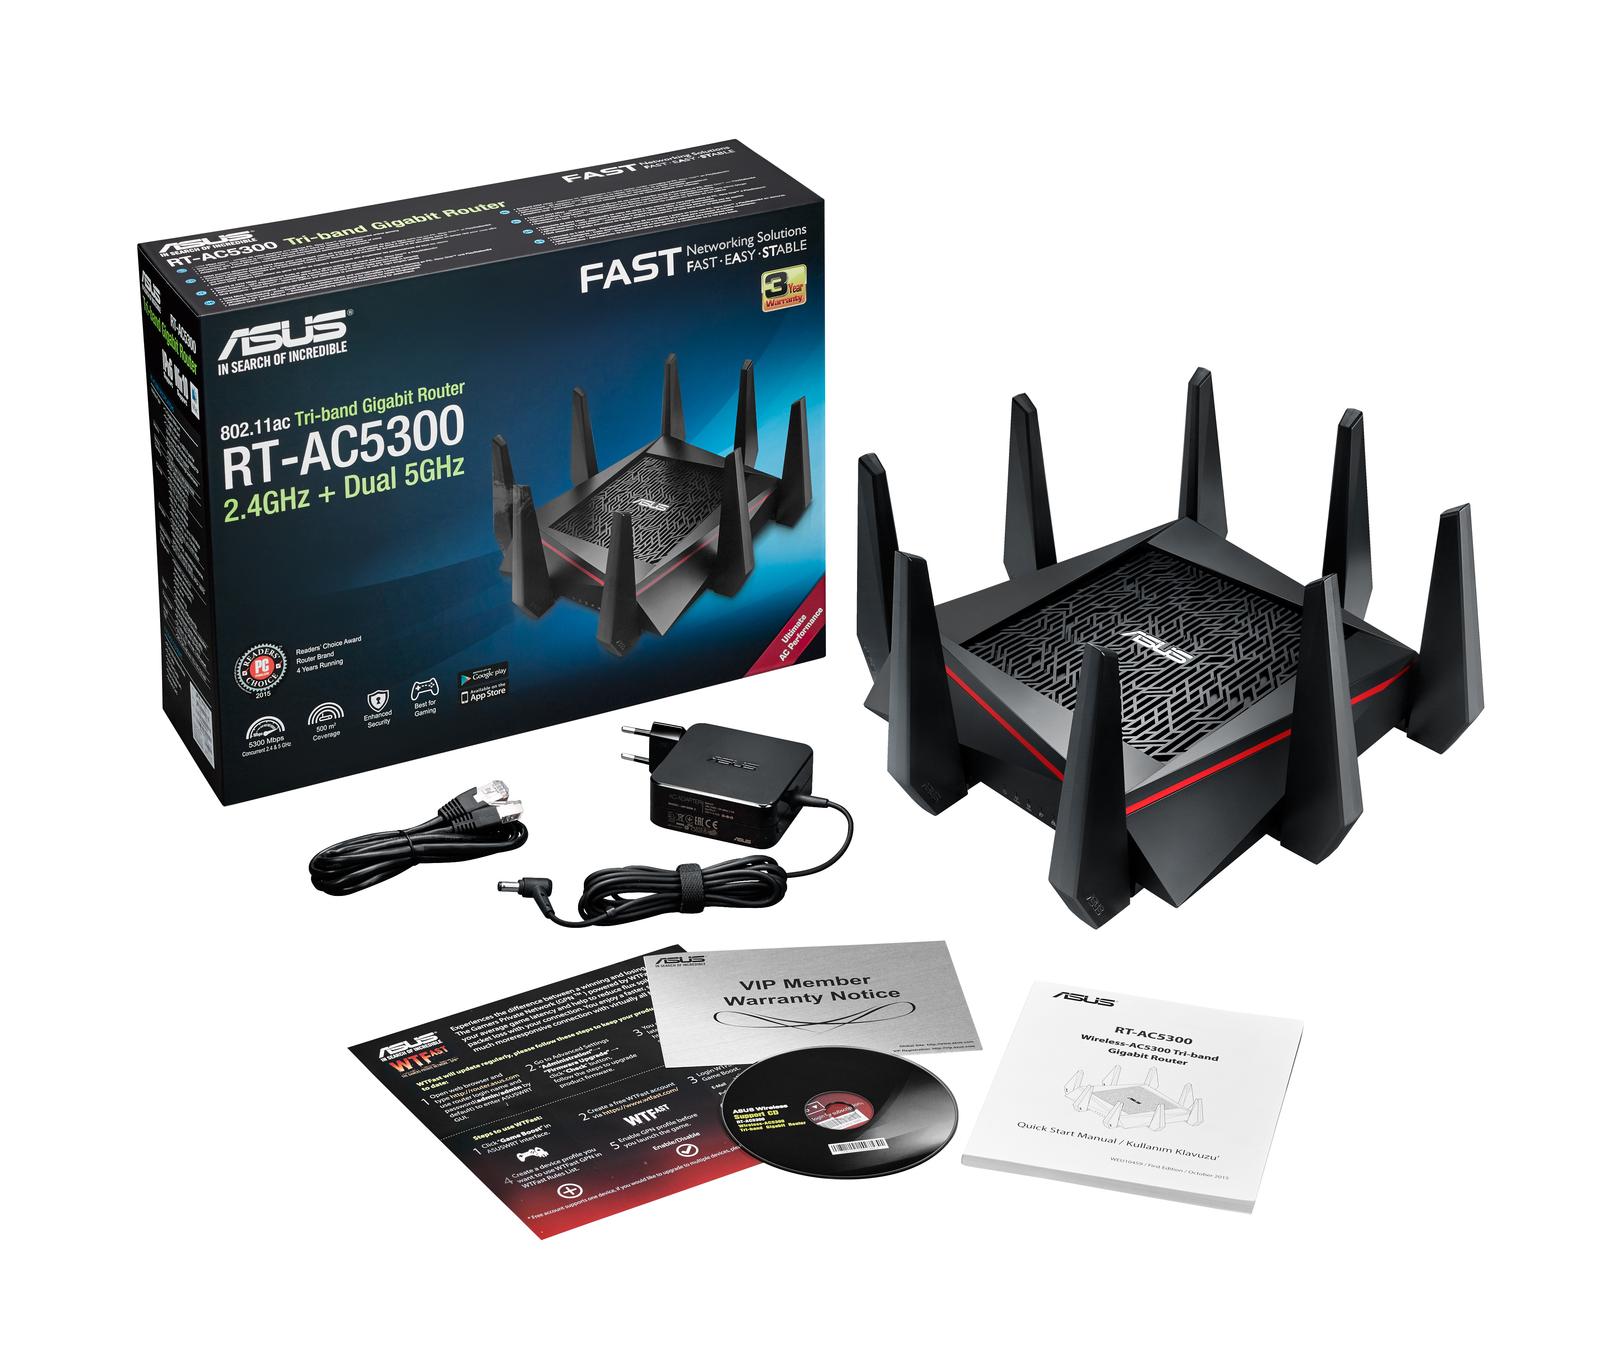 Asus Wireless Tri-Band Gigabit Router - FIBRE Ready image